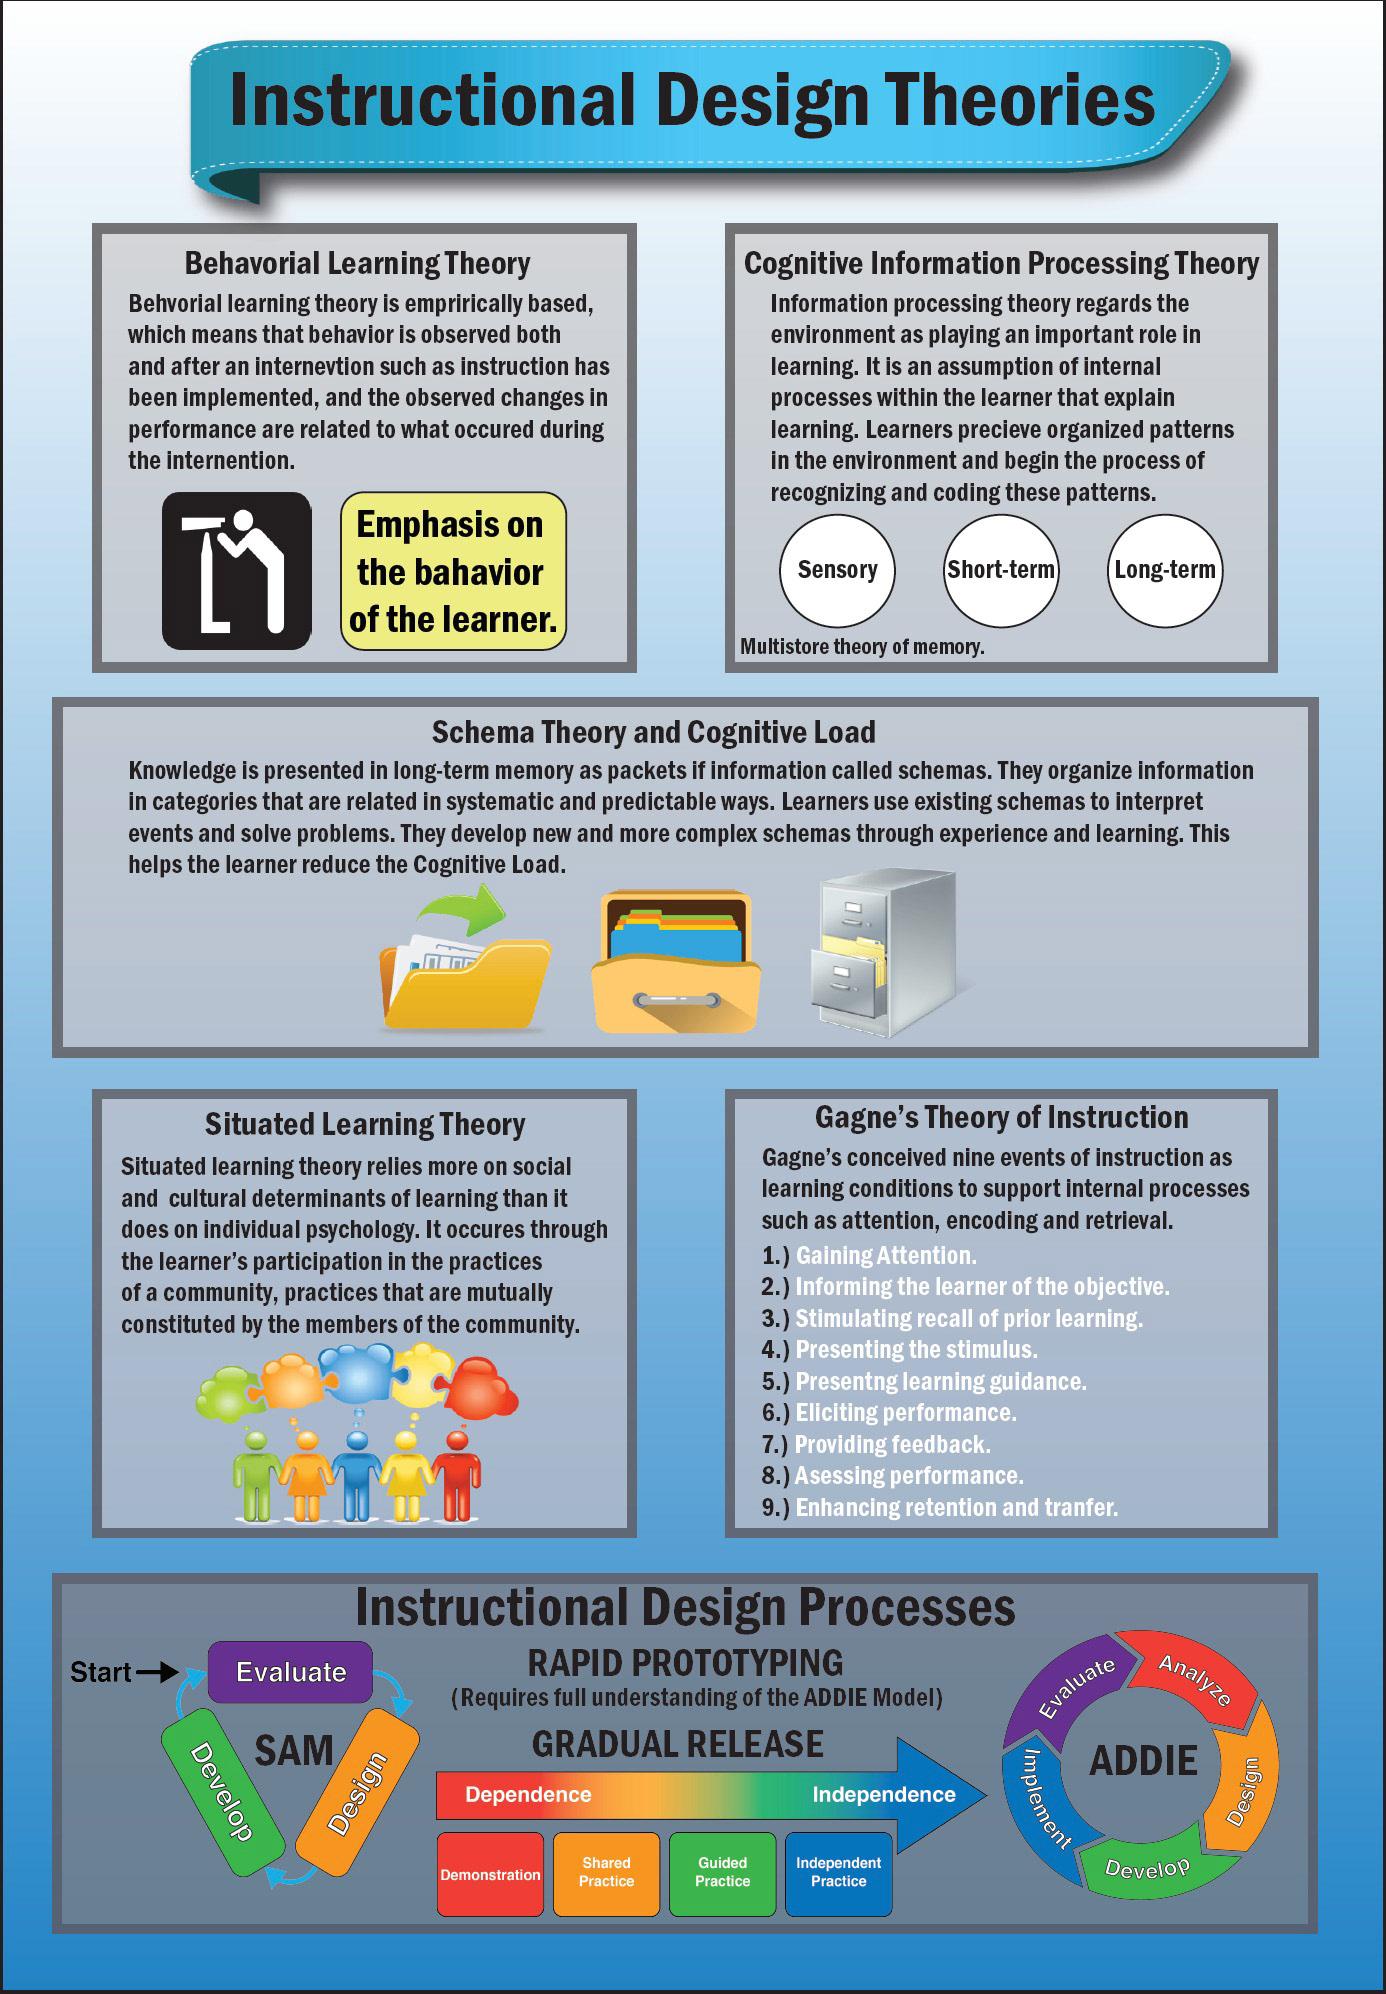 Laura Jimenez Instructional Design Theories